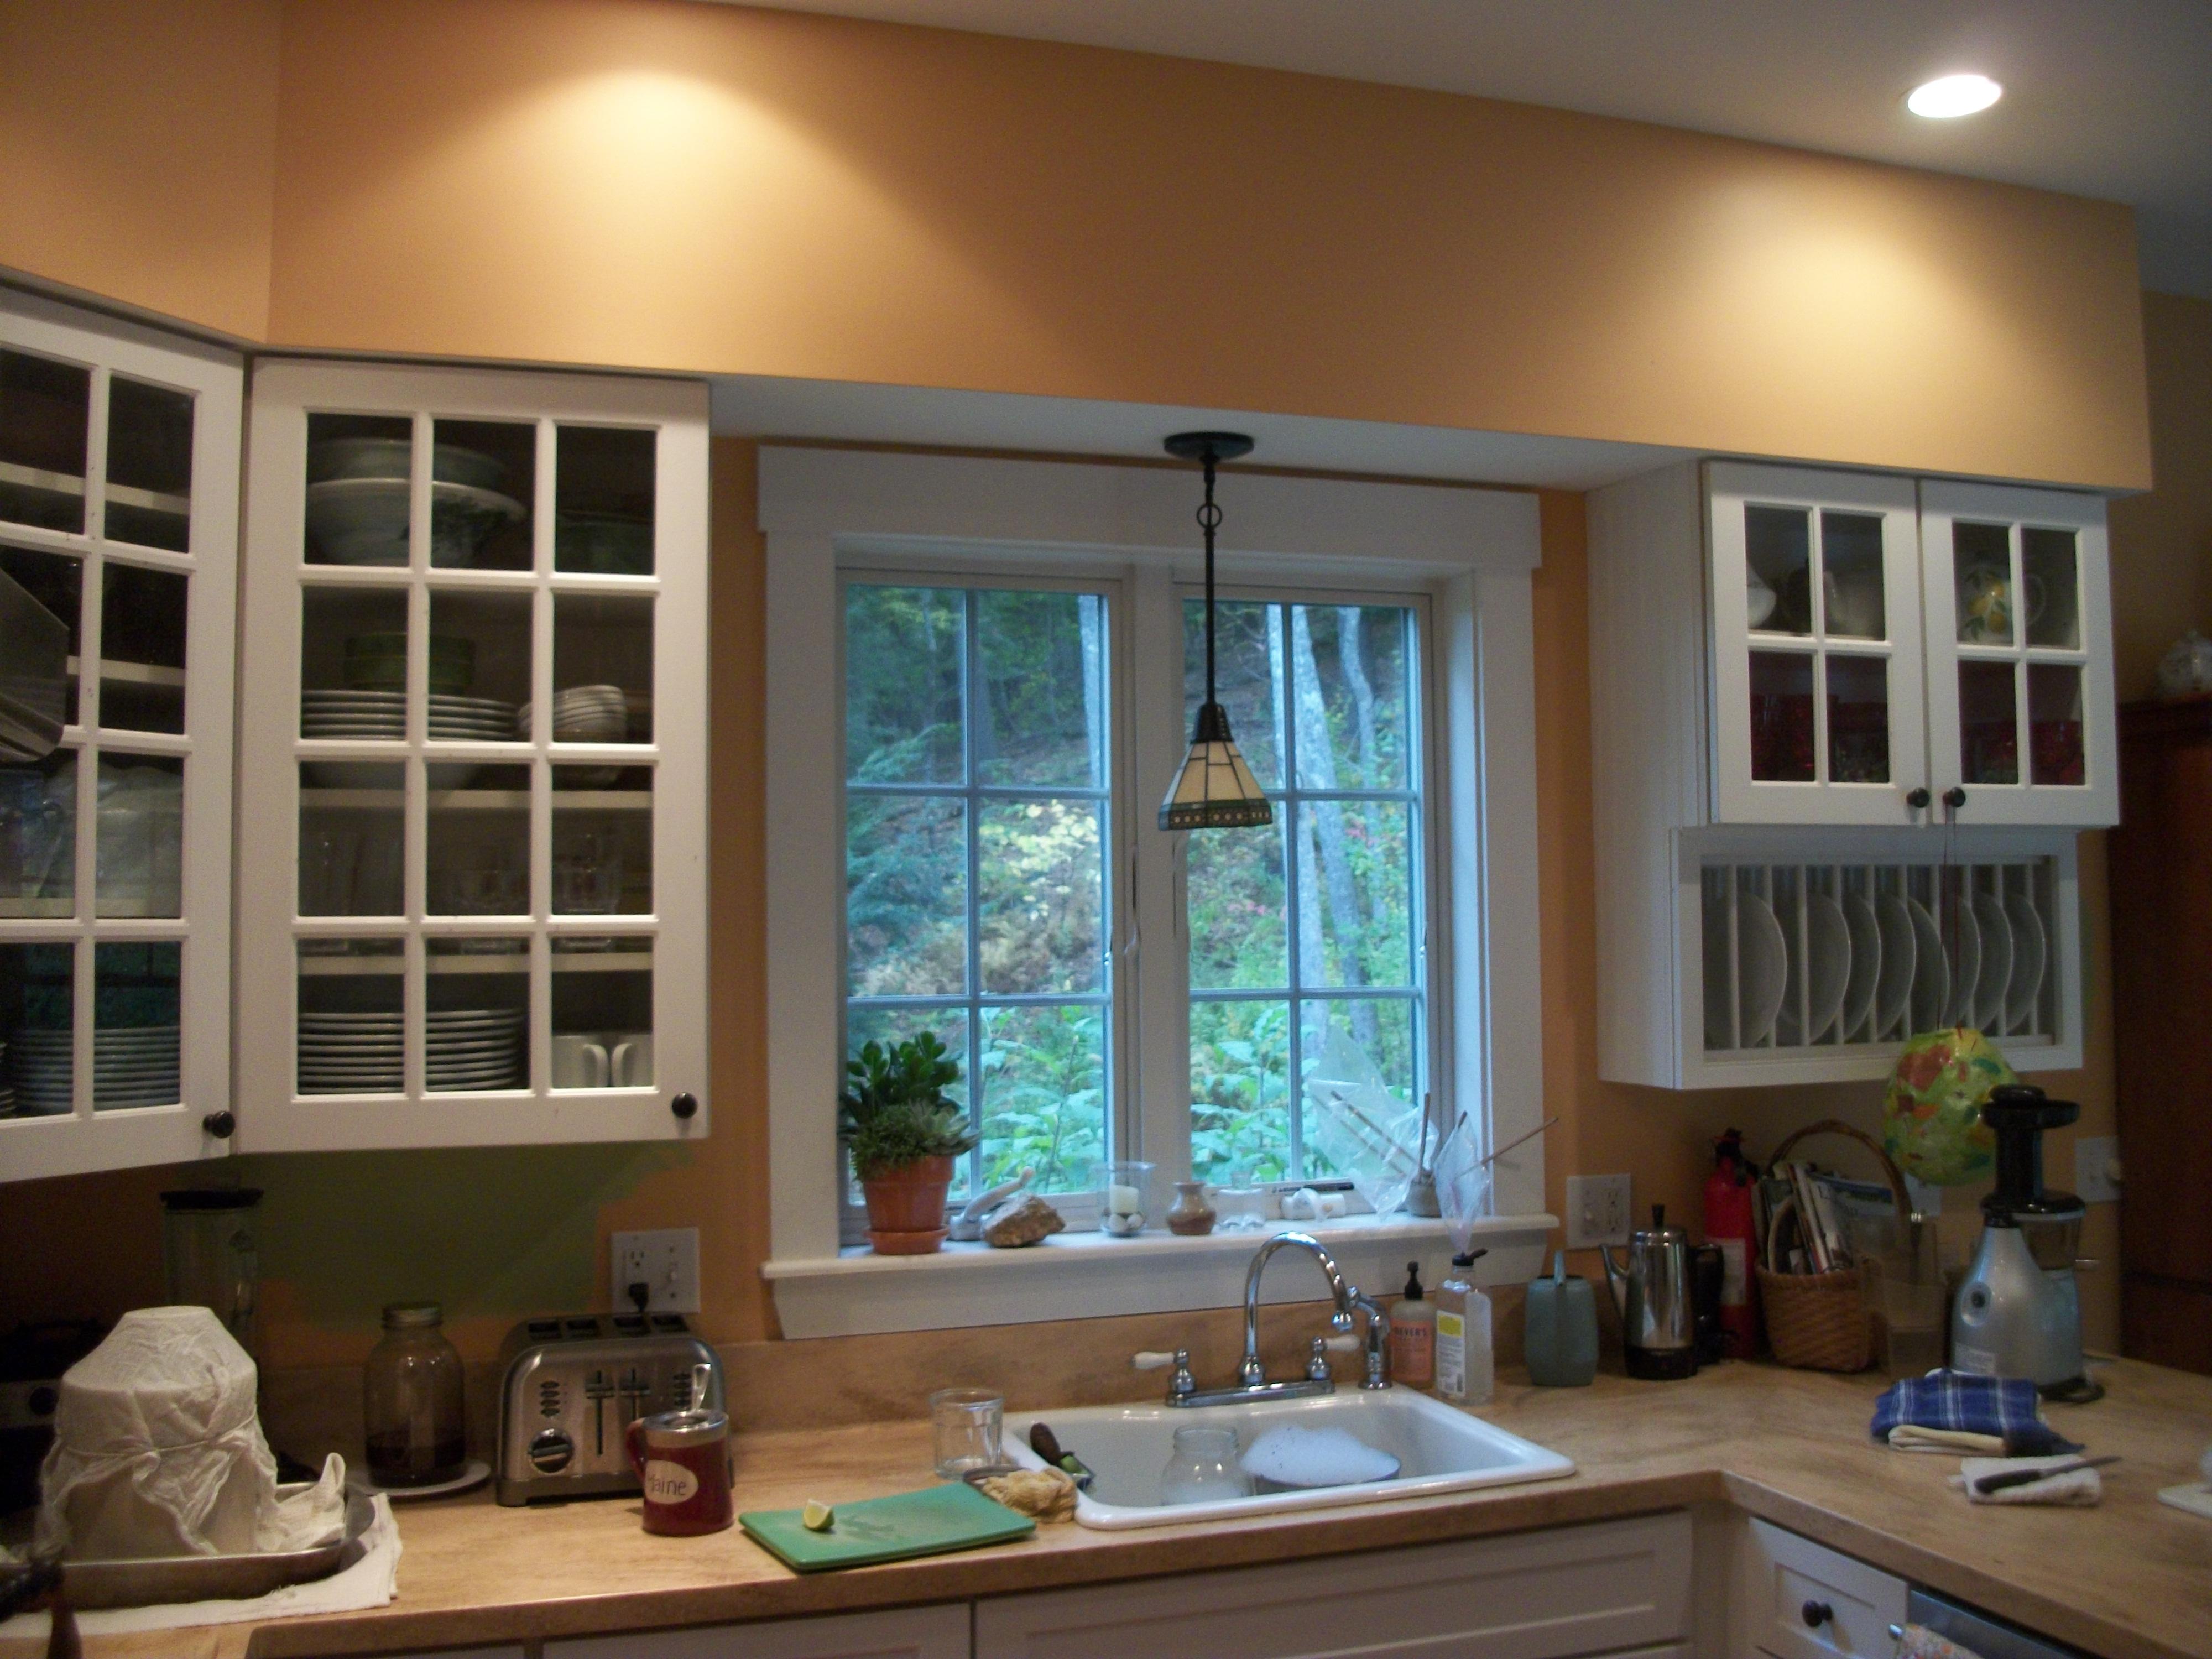 Turkey Tracks: My Green Kitchen | Louisa Enright\'s Blog